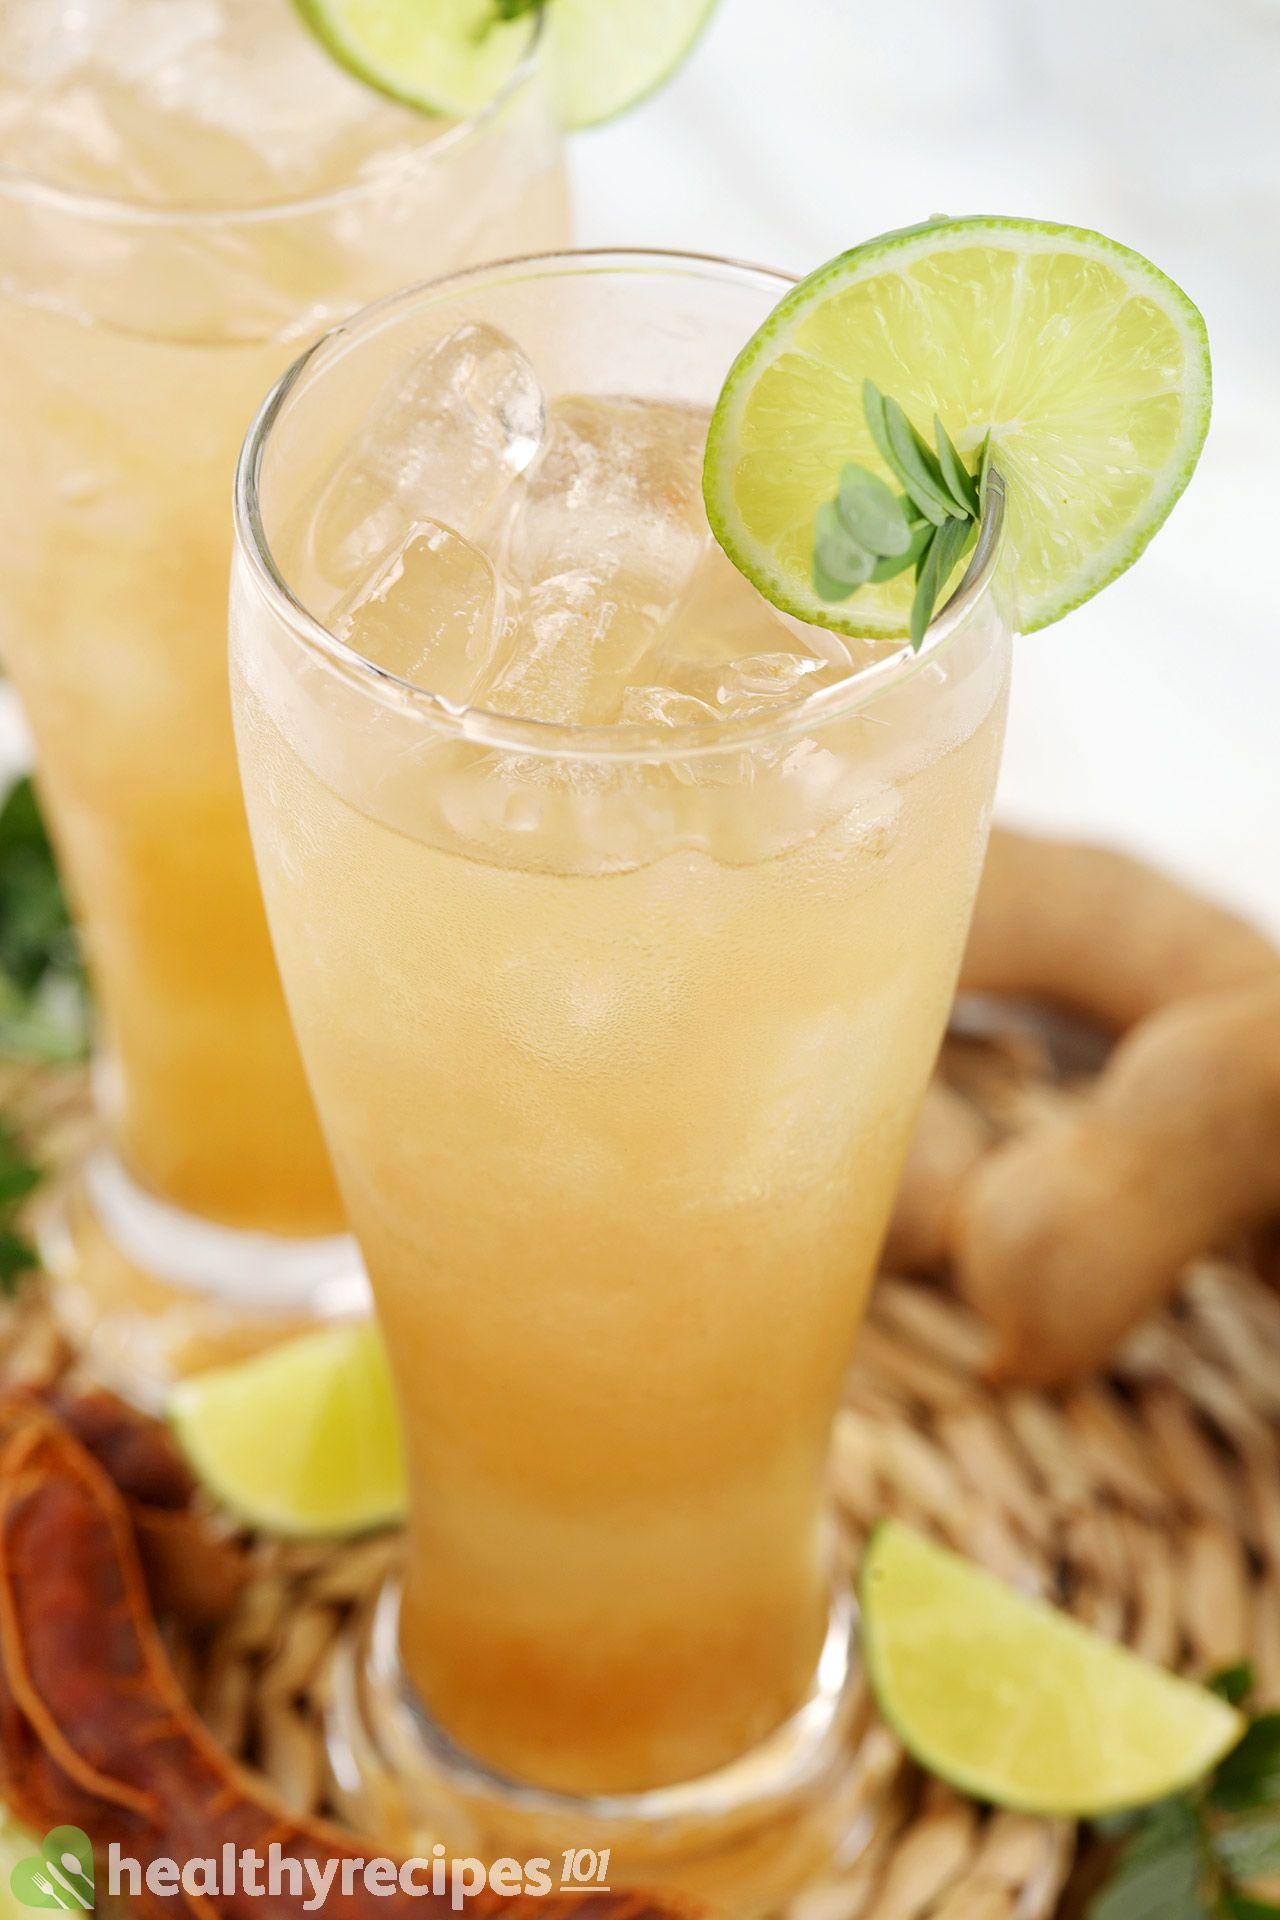 homemade tamarind juice recipe